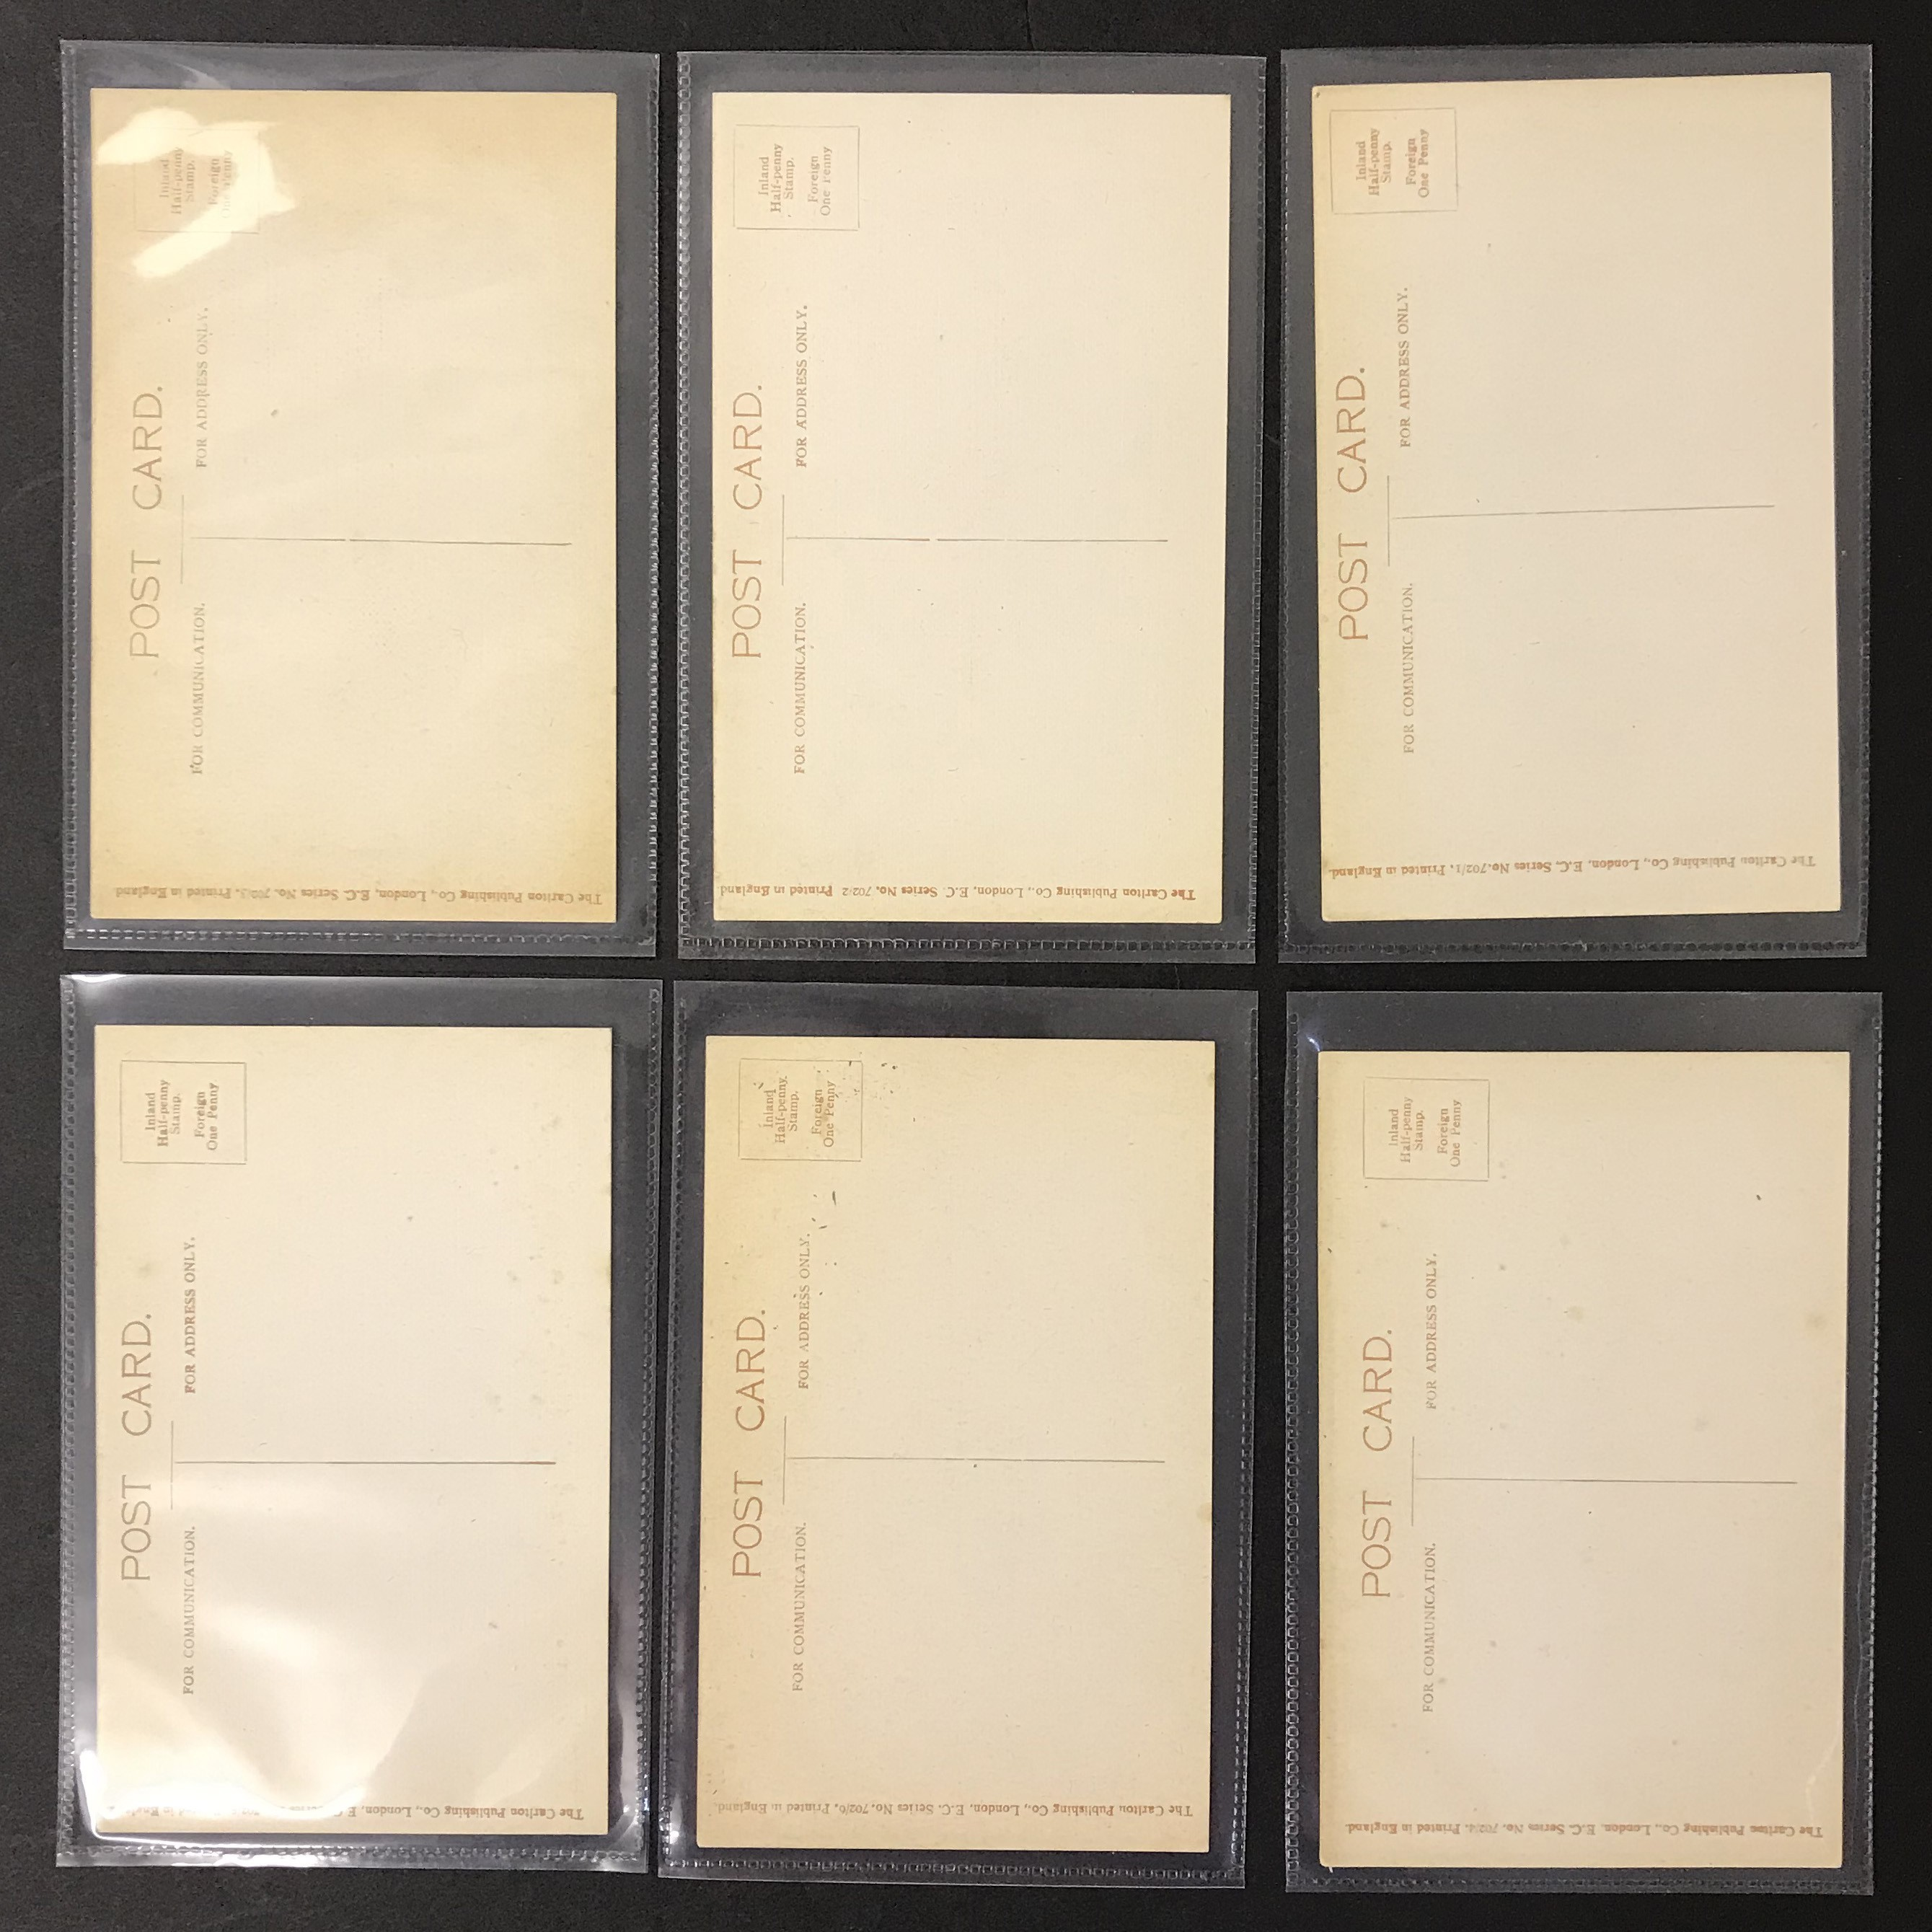 POSTCARDS - SET OF SIX GLAMOUR POSTCARDS - Image 2 of 8